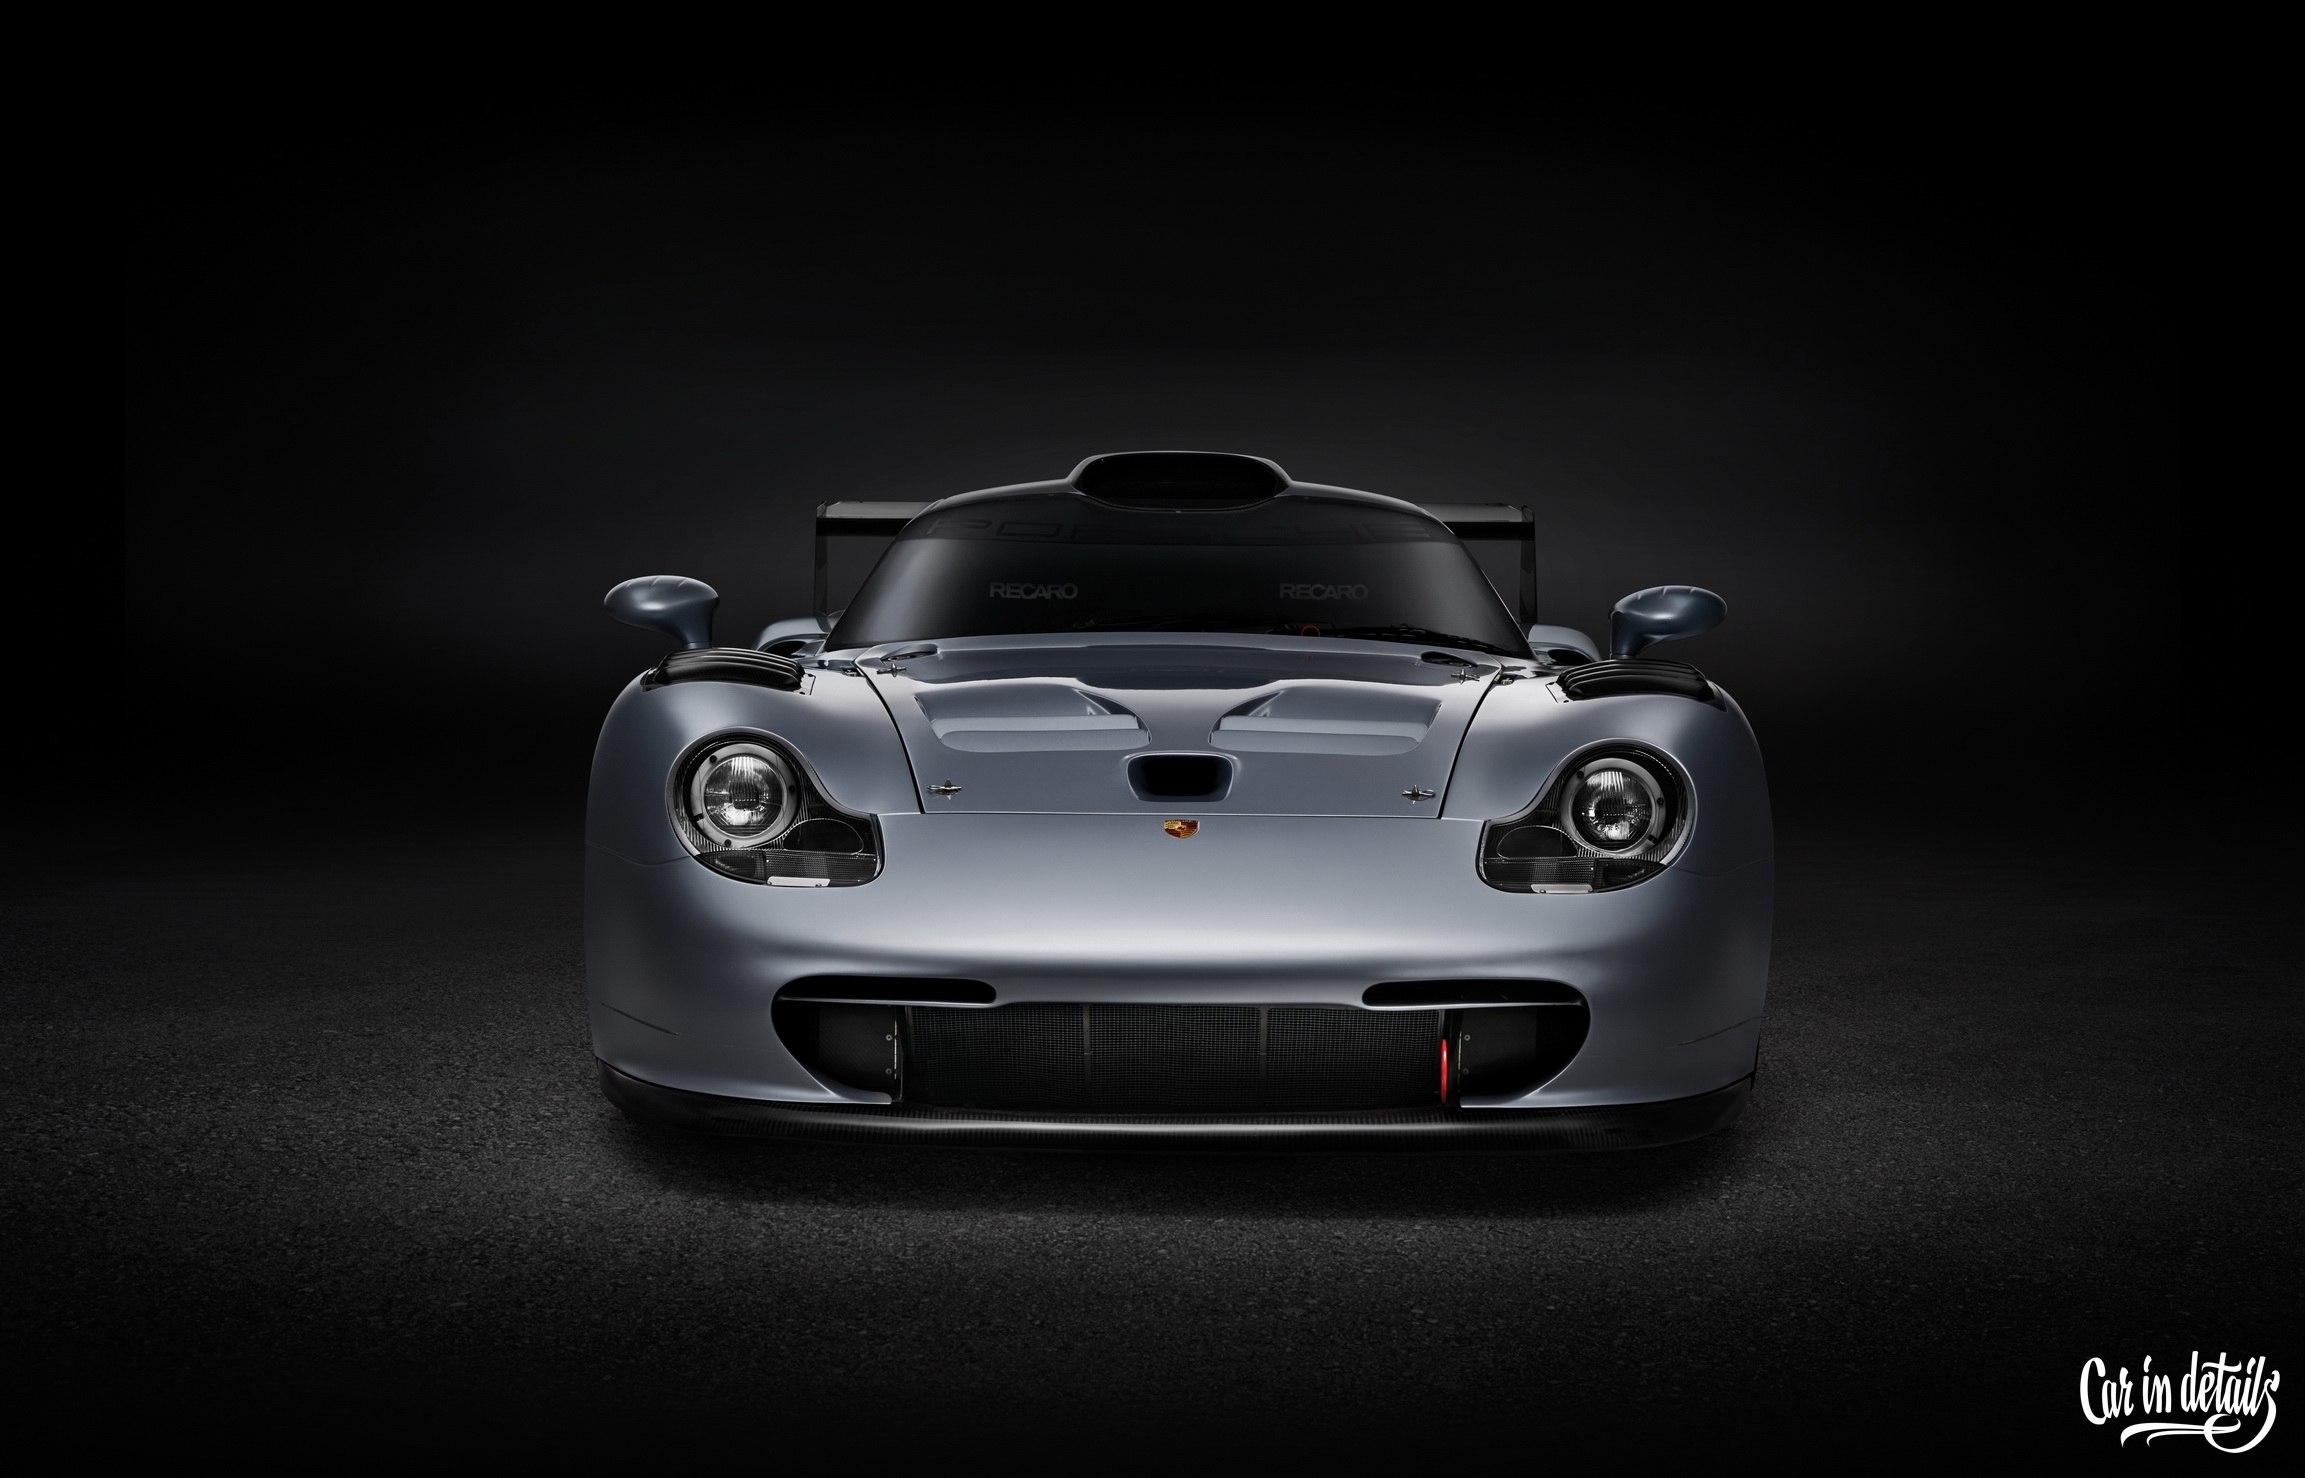 df7dyqjfGGU Elegant Porsche 911 Gt1 Evo Fly Cars Trend